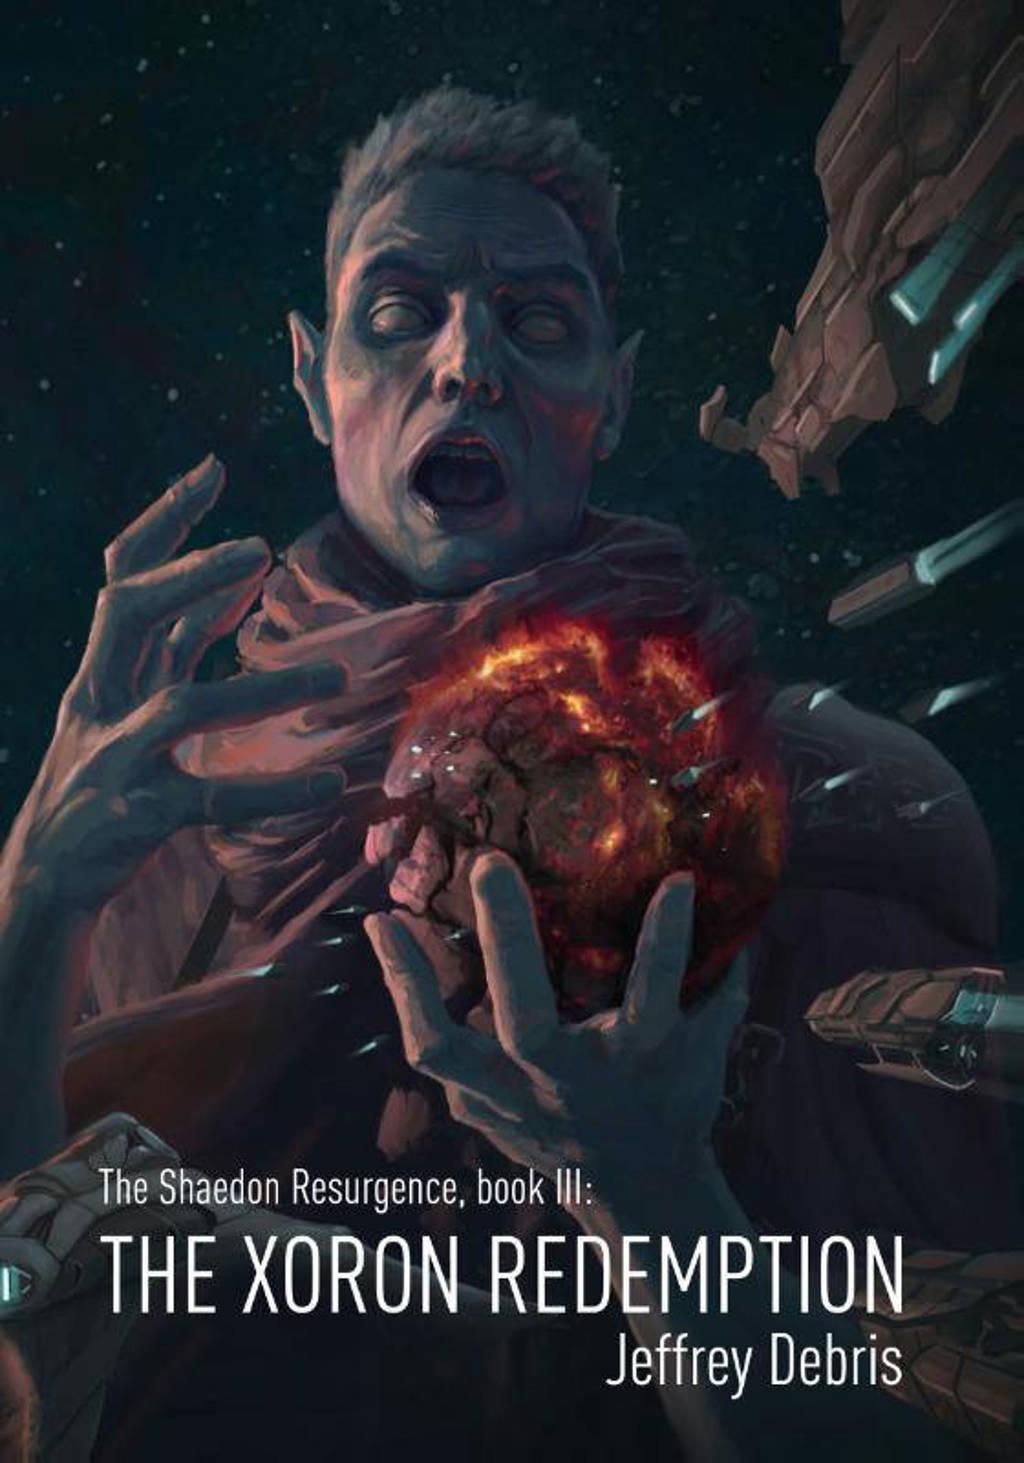 The Shaedon Resurgence: The Xoron Redemption - Jeffrey Debris